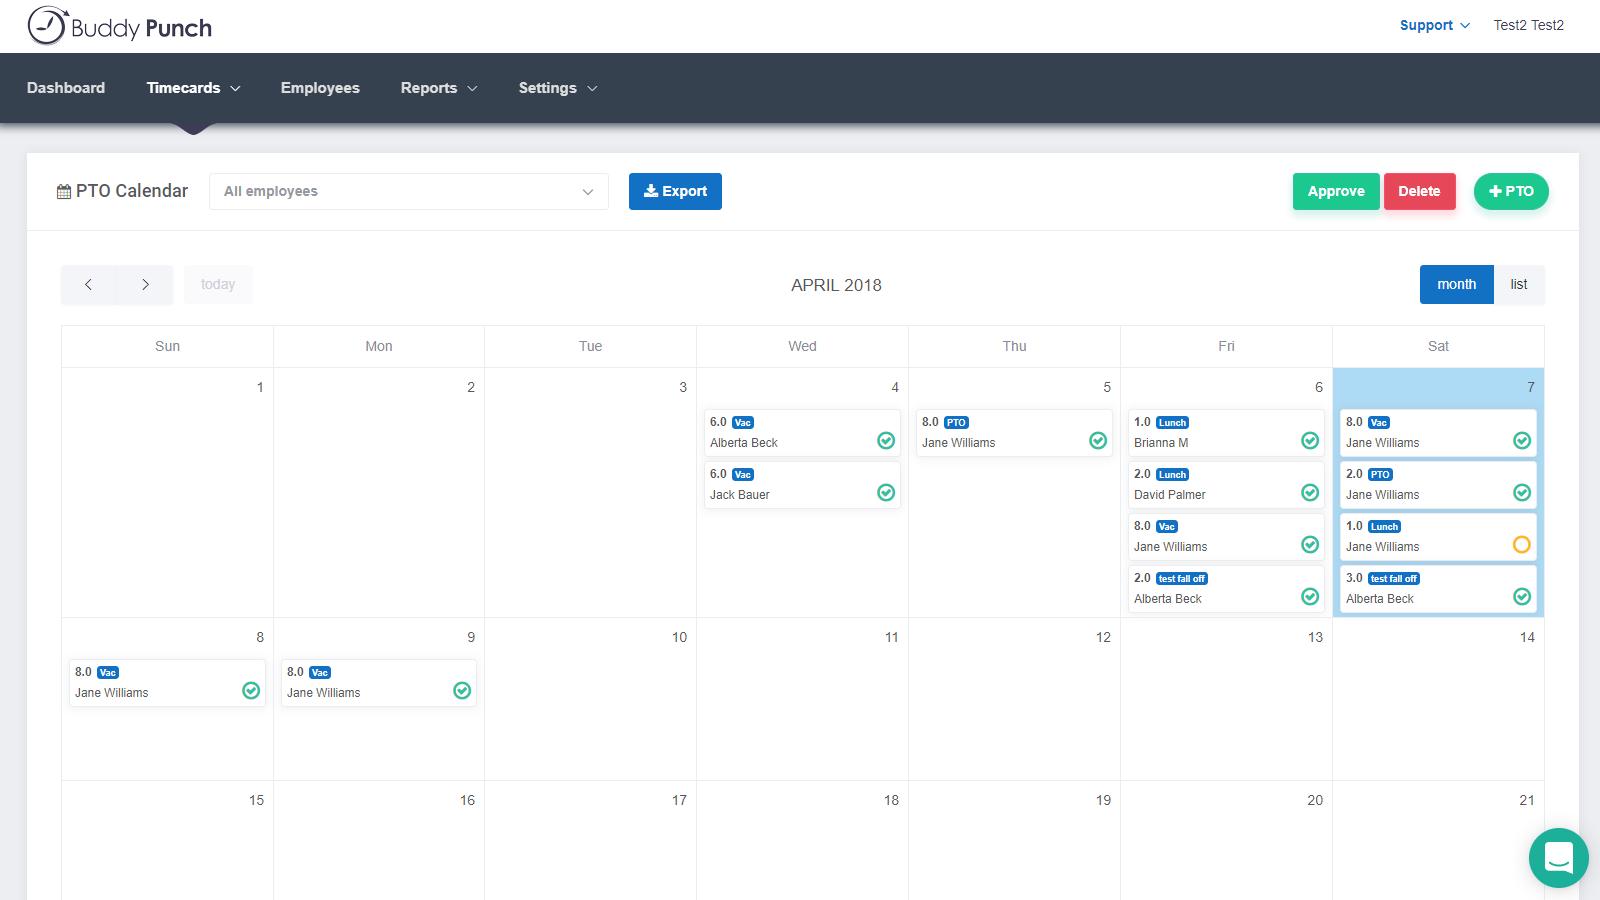 Buddy Punch Software - PTO Calendar